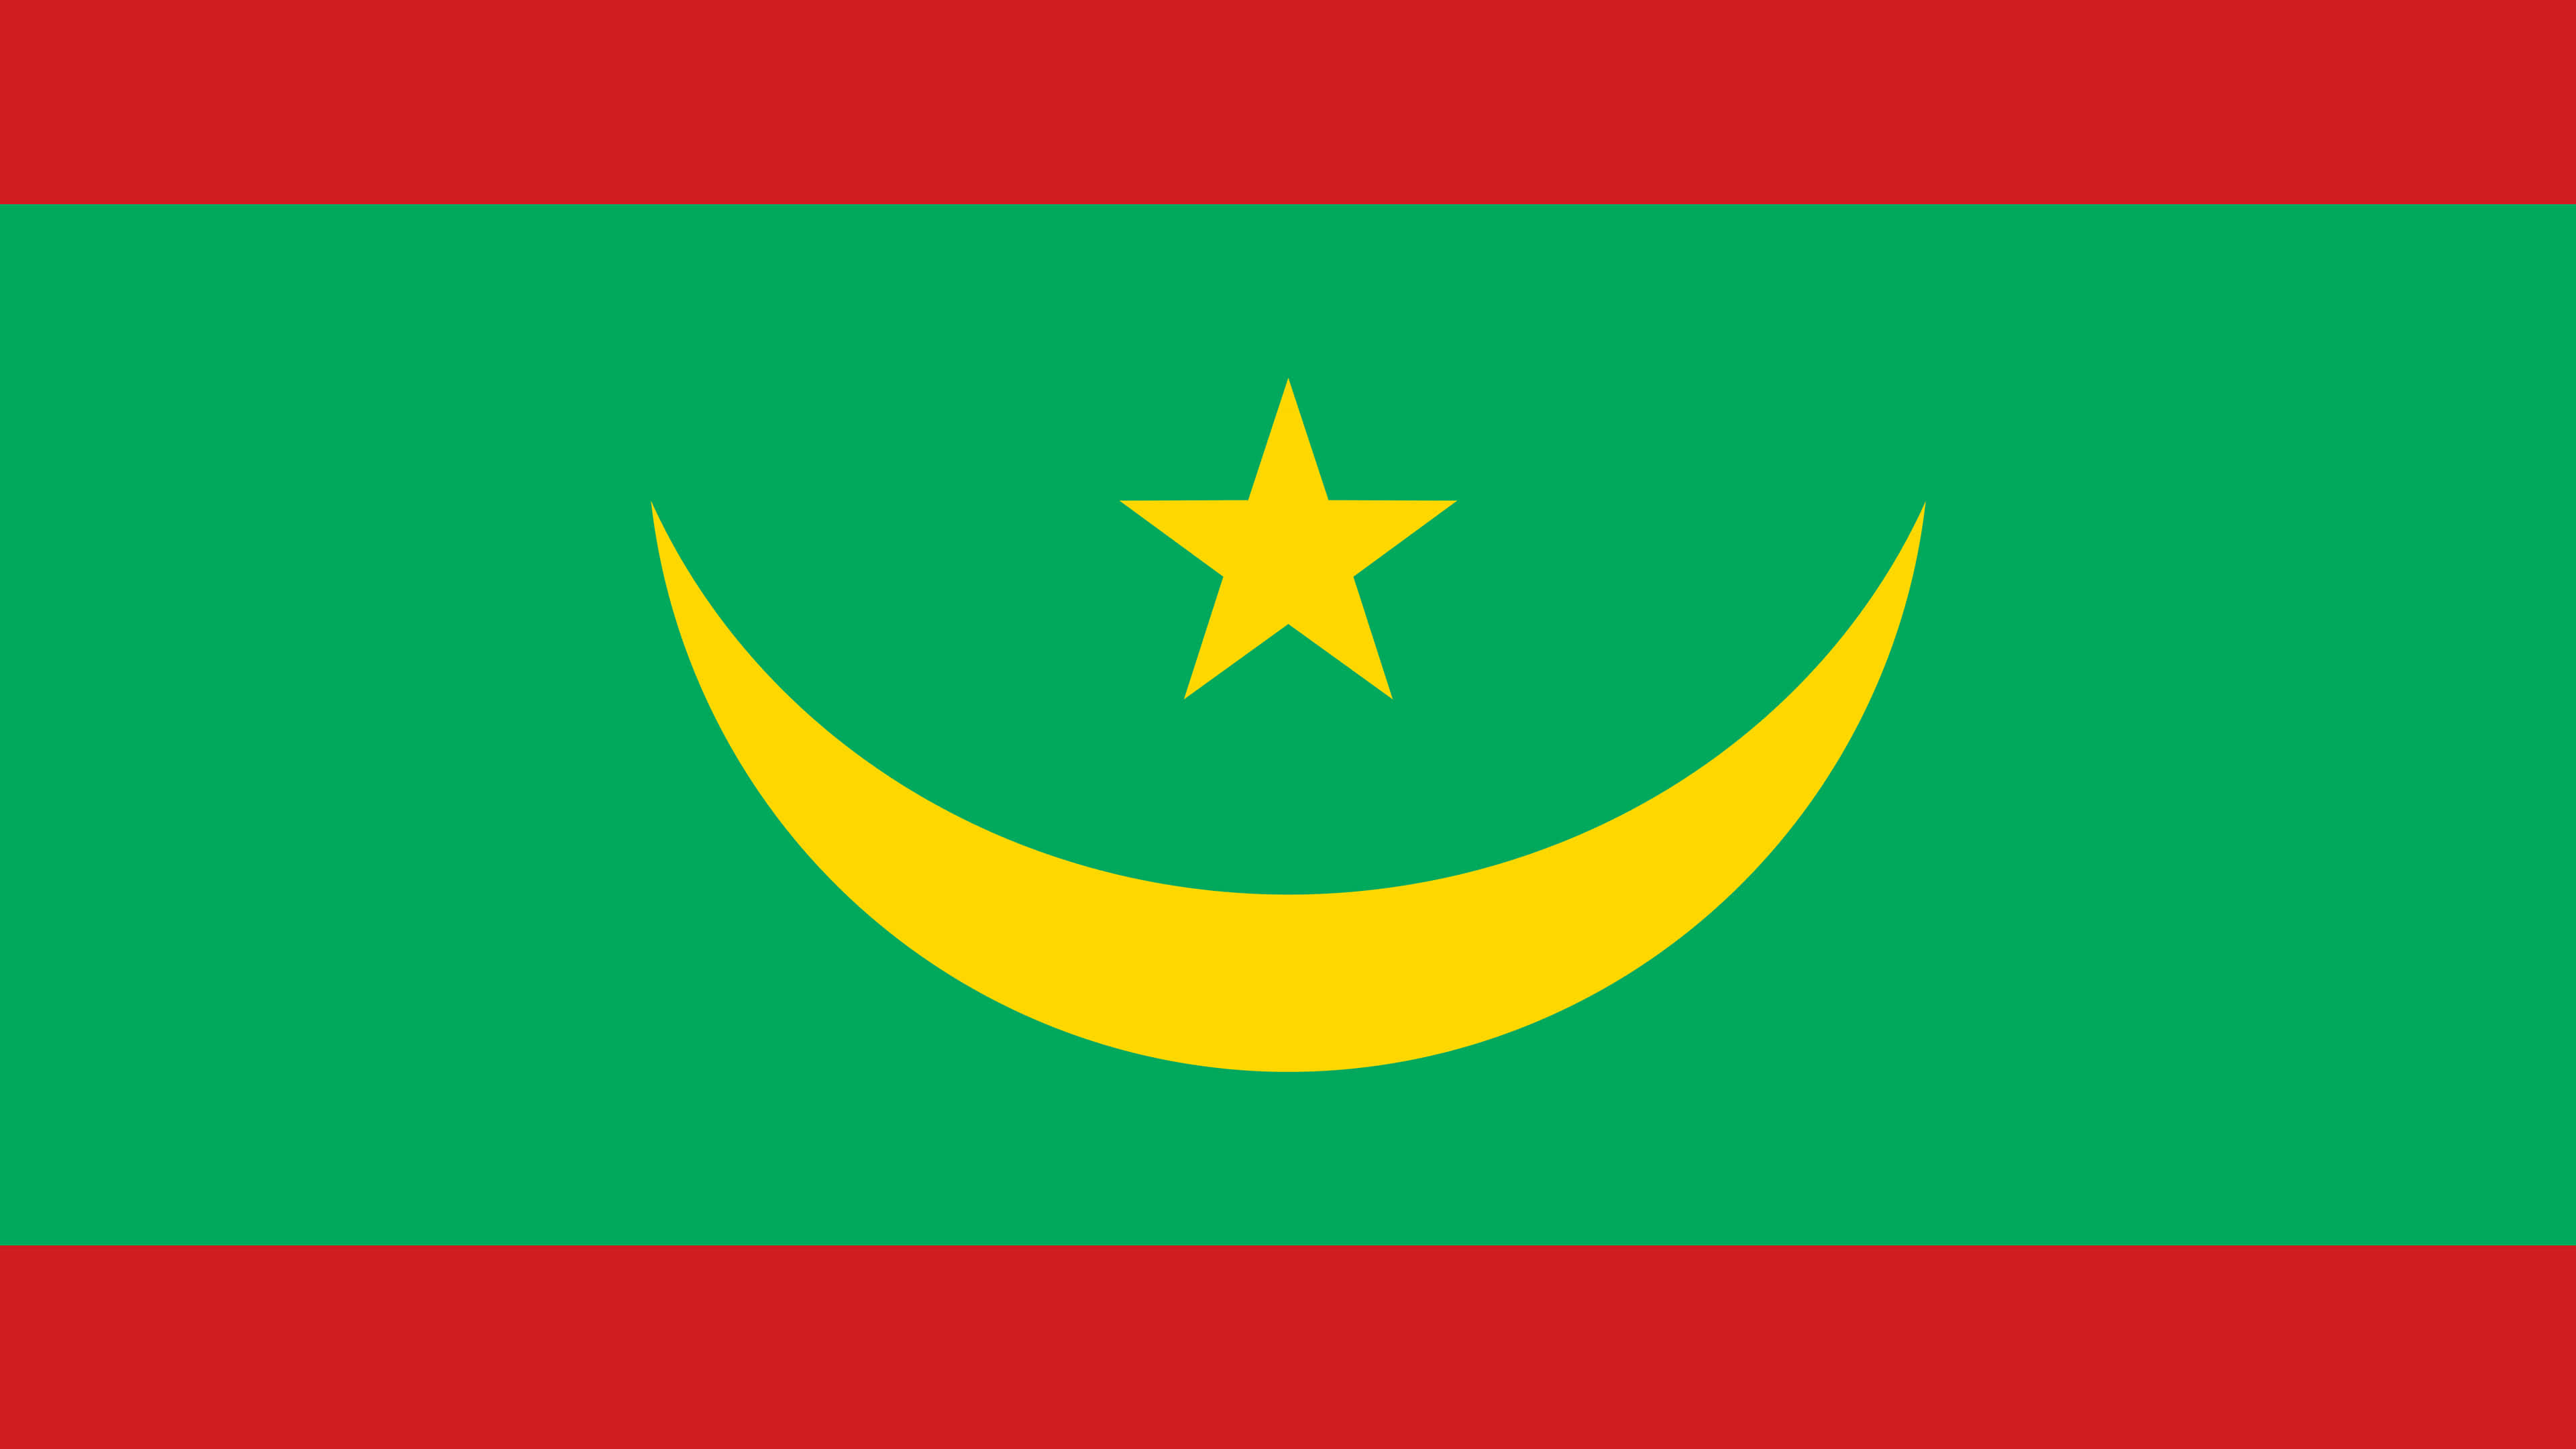 mauritania flag uhd 4k wallpaper